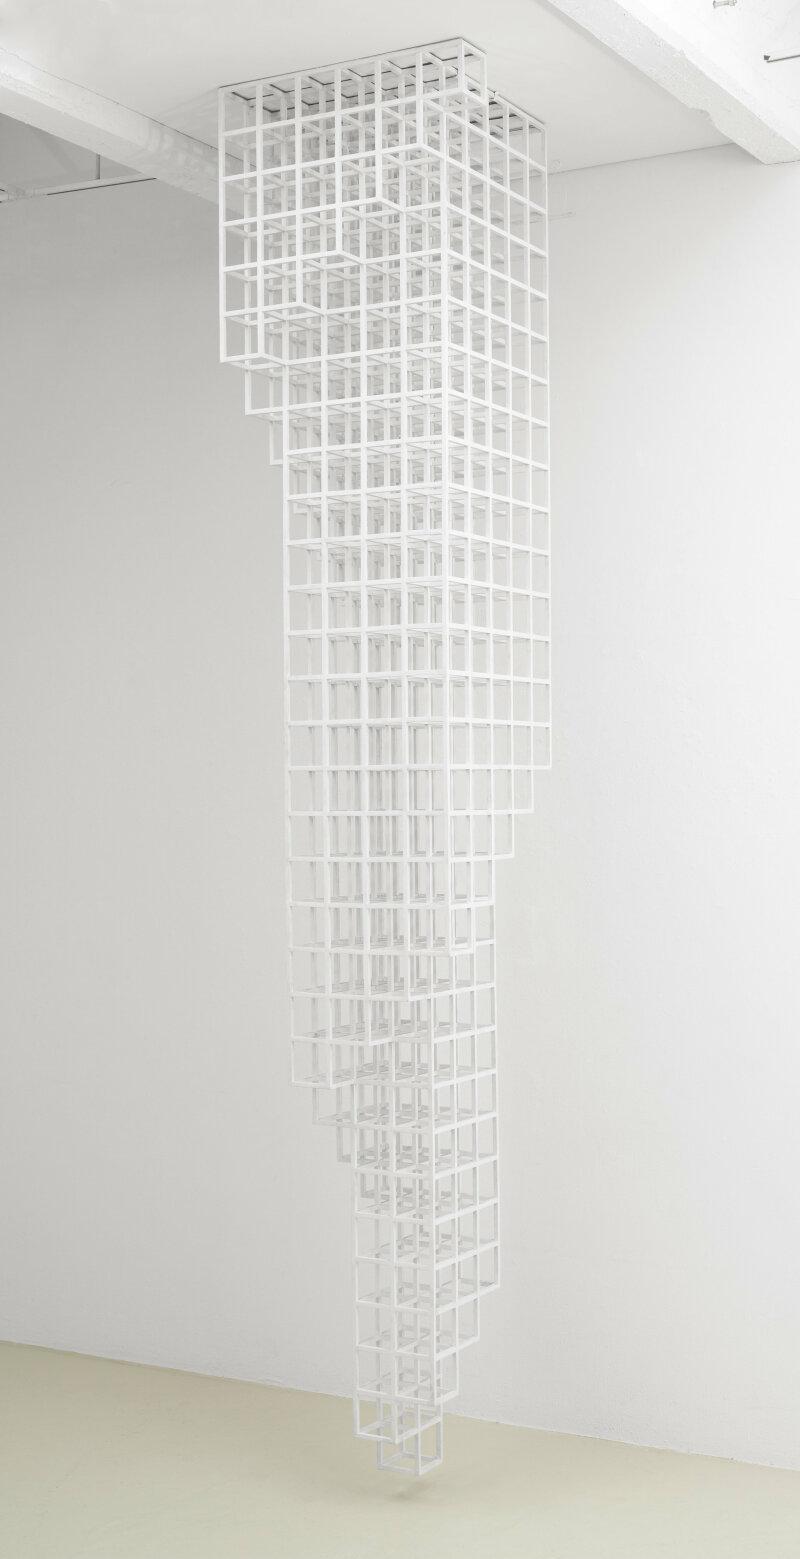 "Sol LeWitt, Inverted Spiraling Tower, 1987wood painted white12' 3-3/4"" x 2' 5"" x 2' 5"" (375.3 cm x 73.7 cm x 73.7 cm)SCULPTURENo. 36644, Format of original photography: digital"